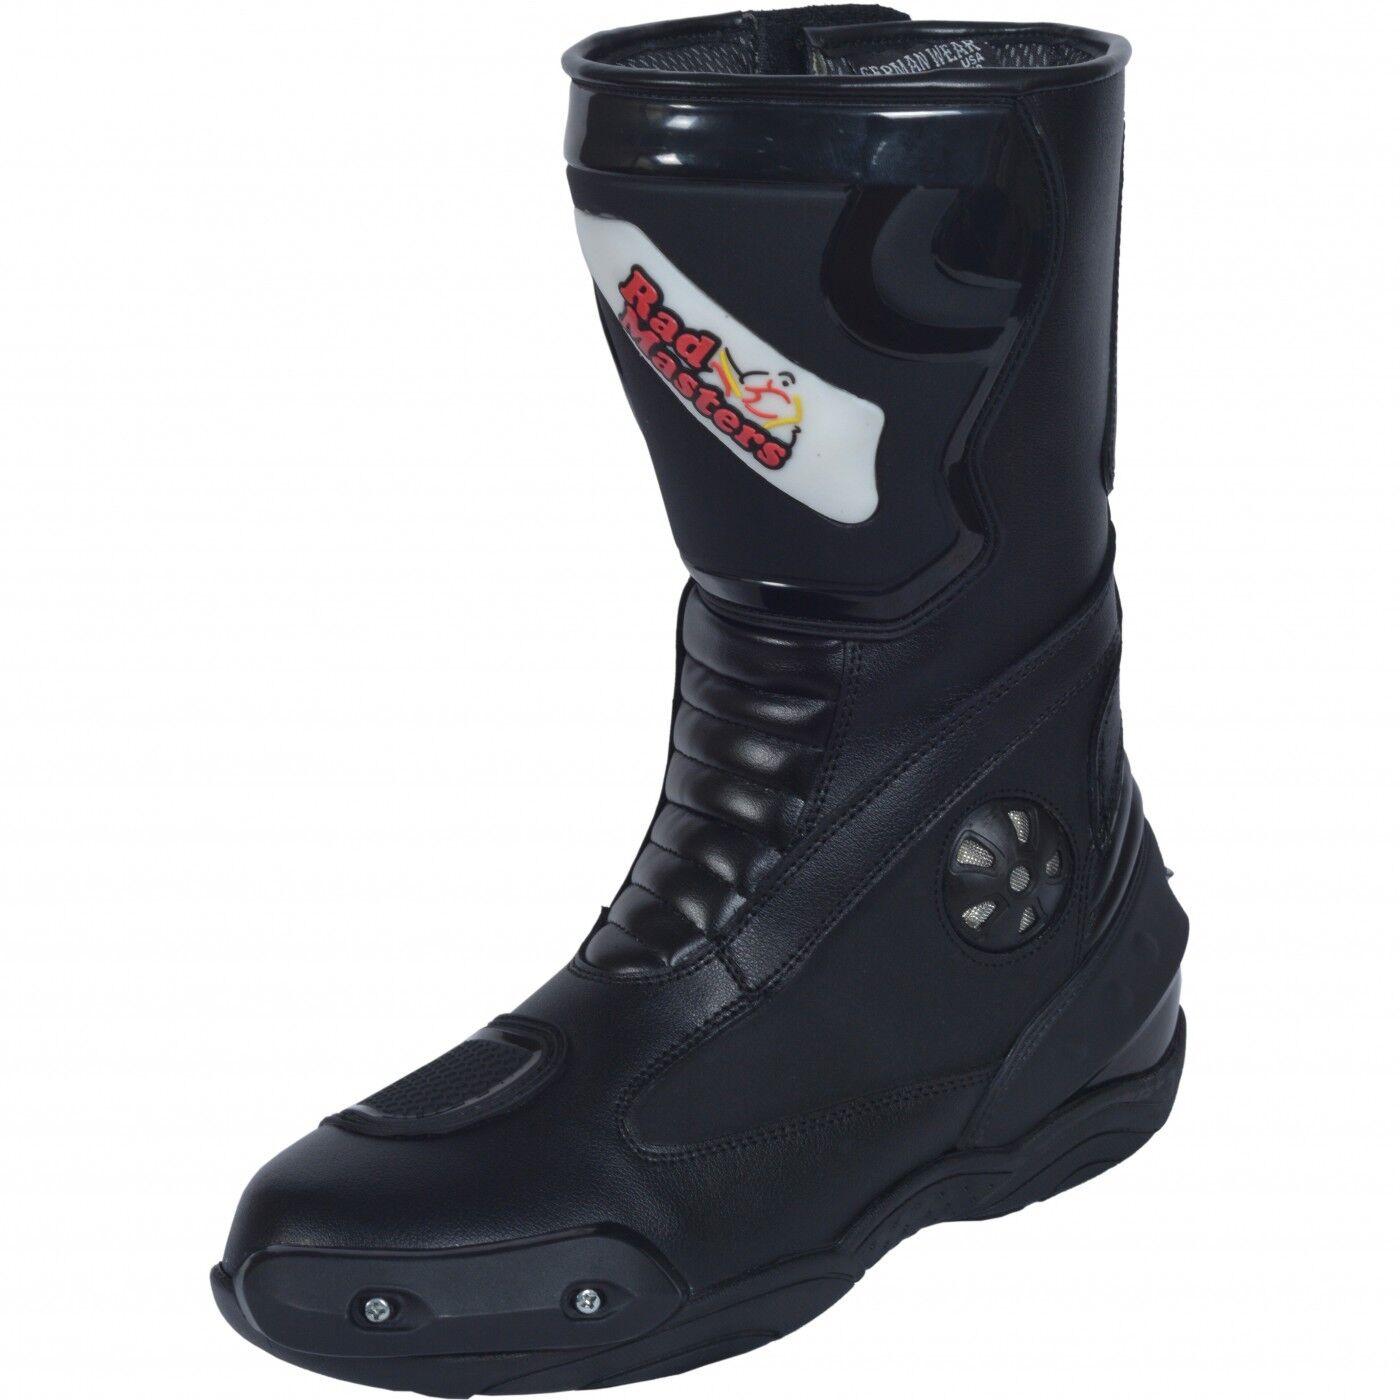 German Wear, motocicleta botas moto sport touring botas negro 32cm